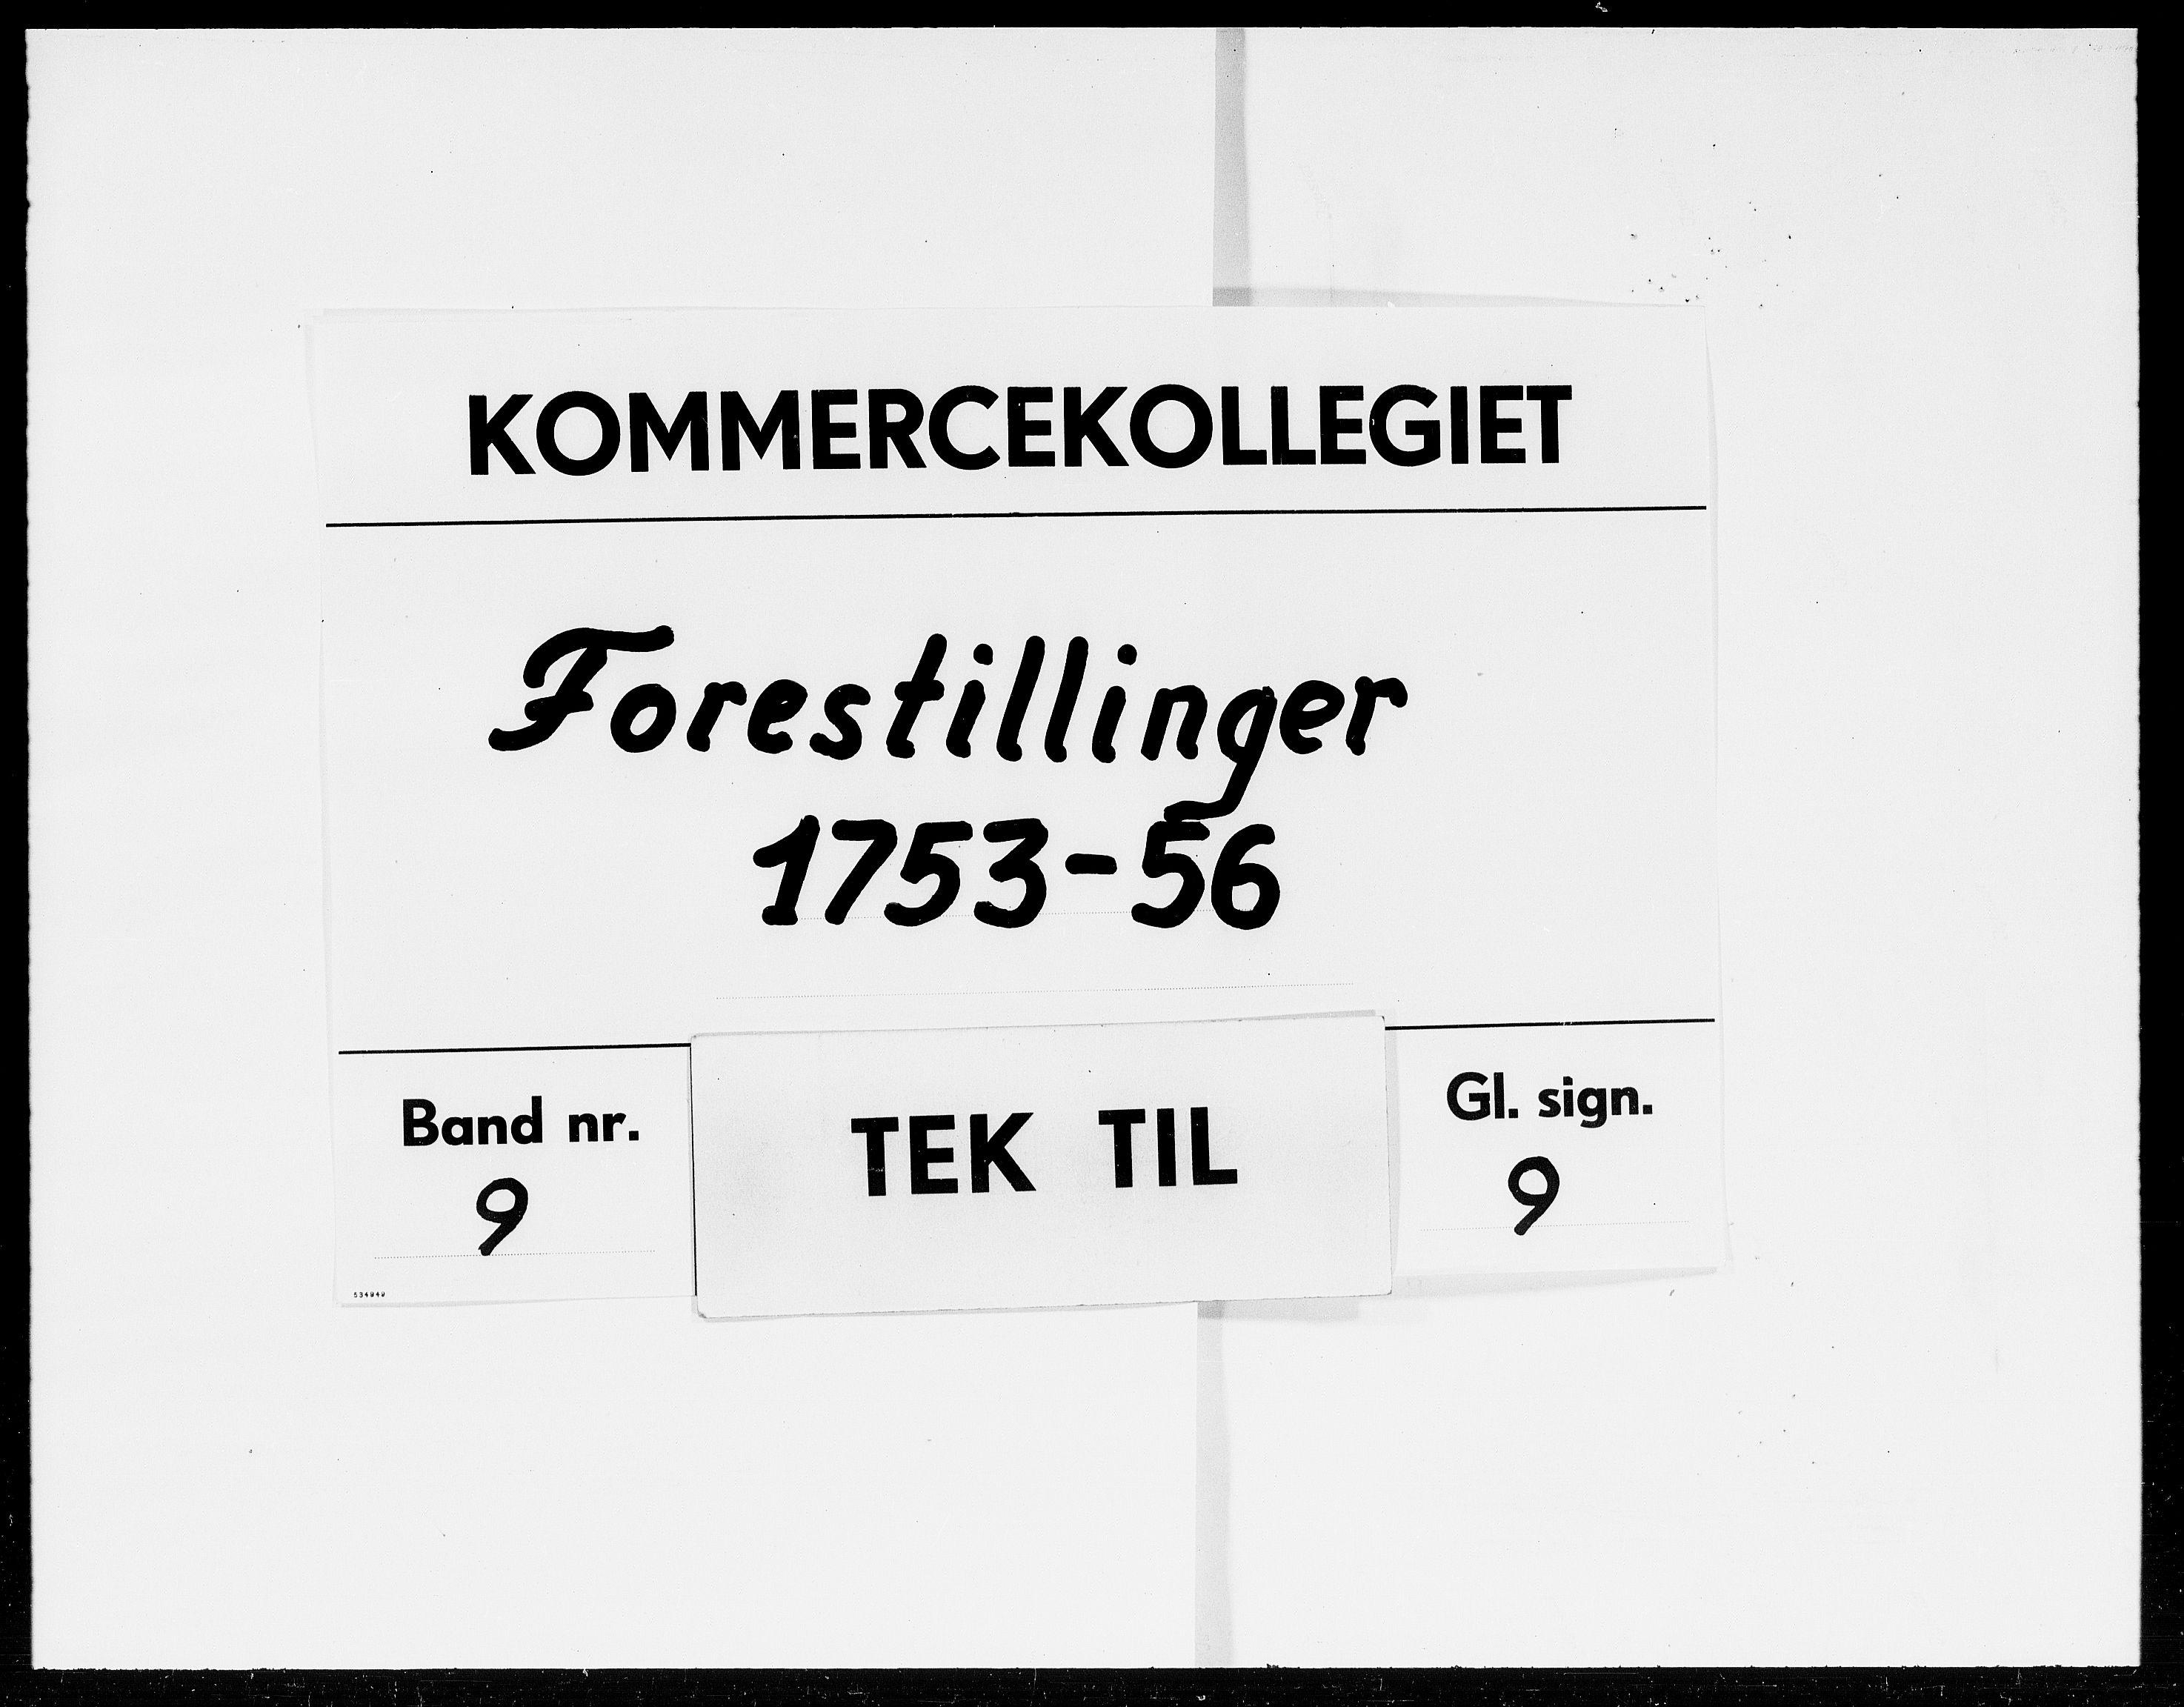 DRA, Kommercekollegiet, Dansk-Norske Sekretariat (1736-1771) / Kommercedeputationen (1771-1773), -/009: Forestillinger, 1753-1756